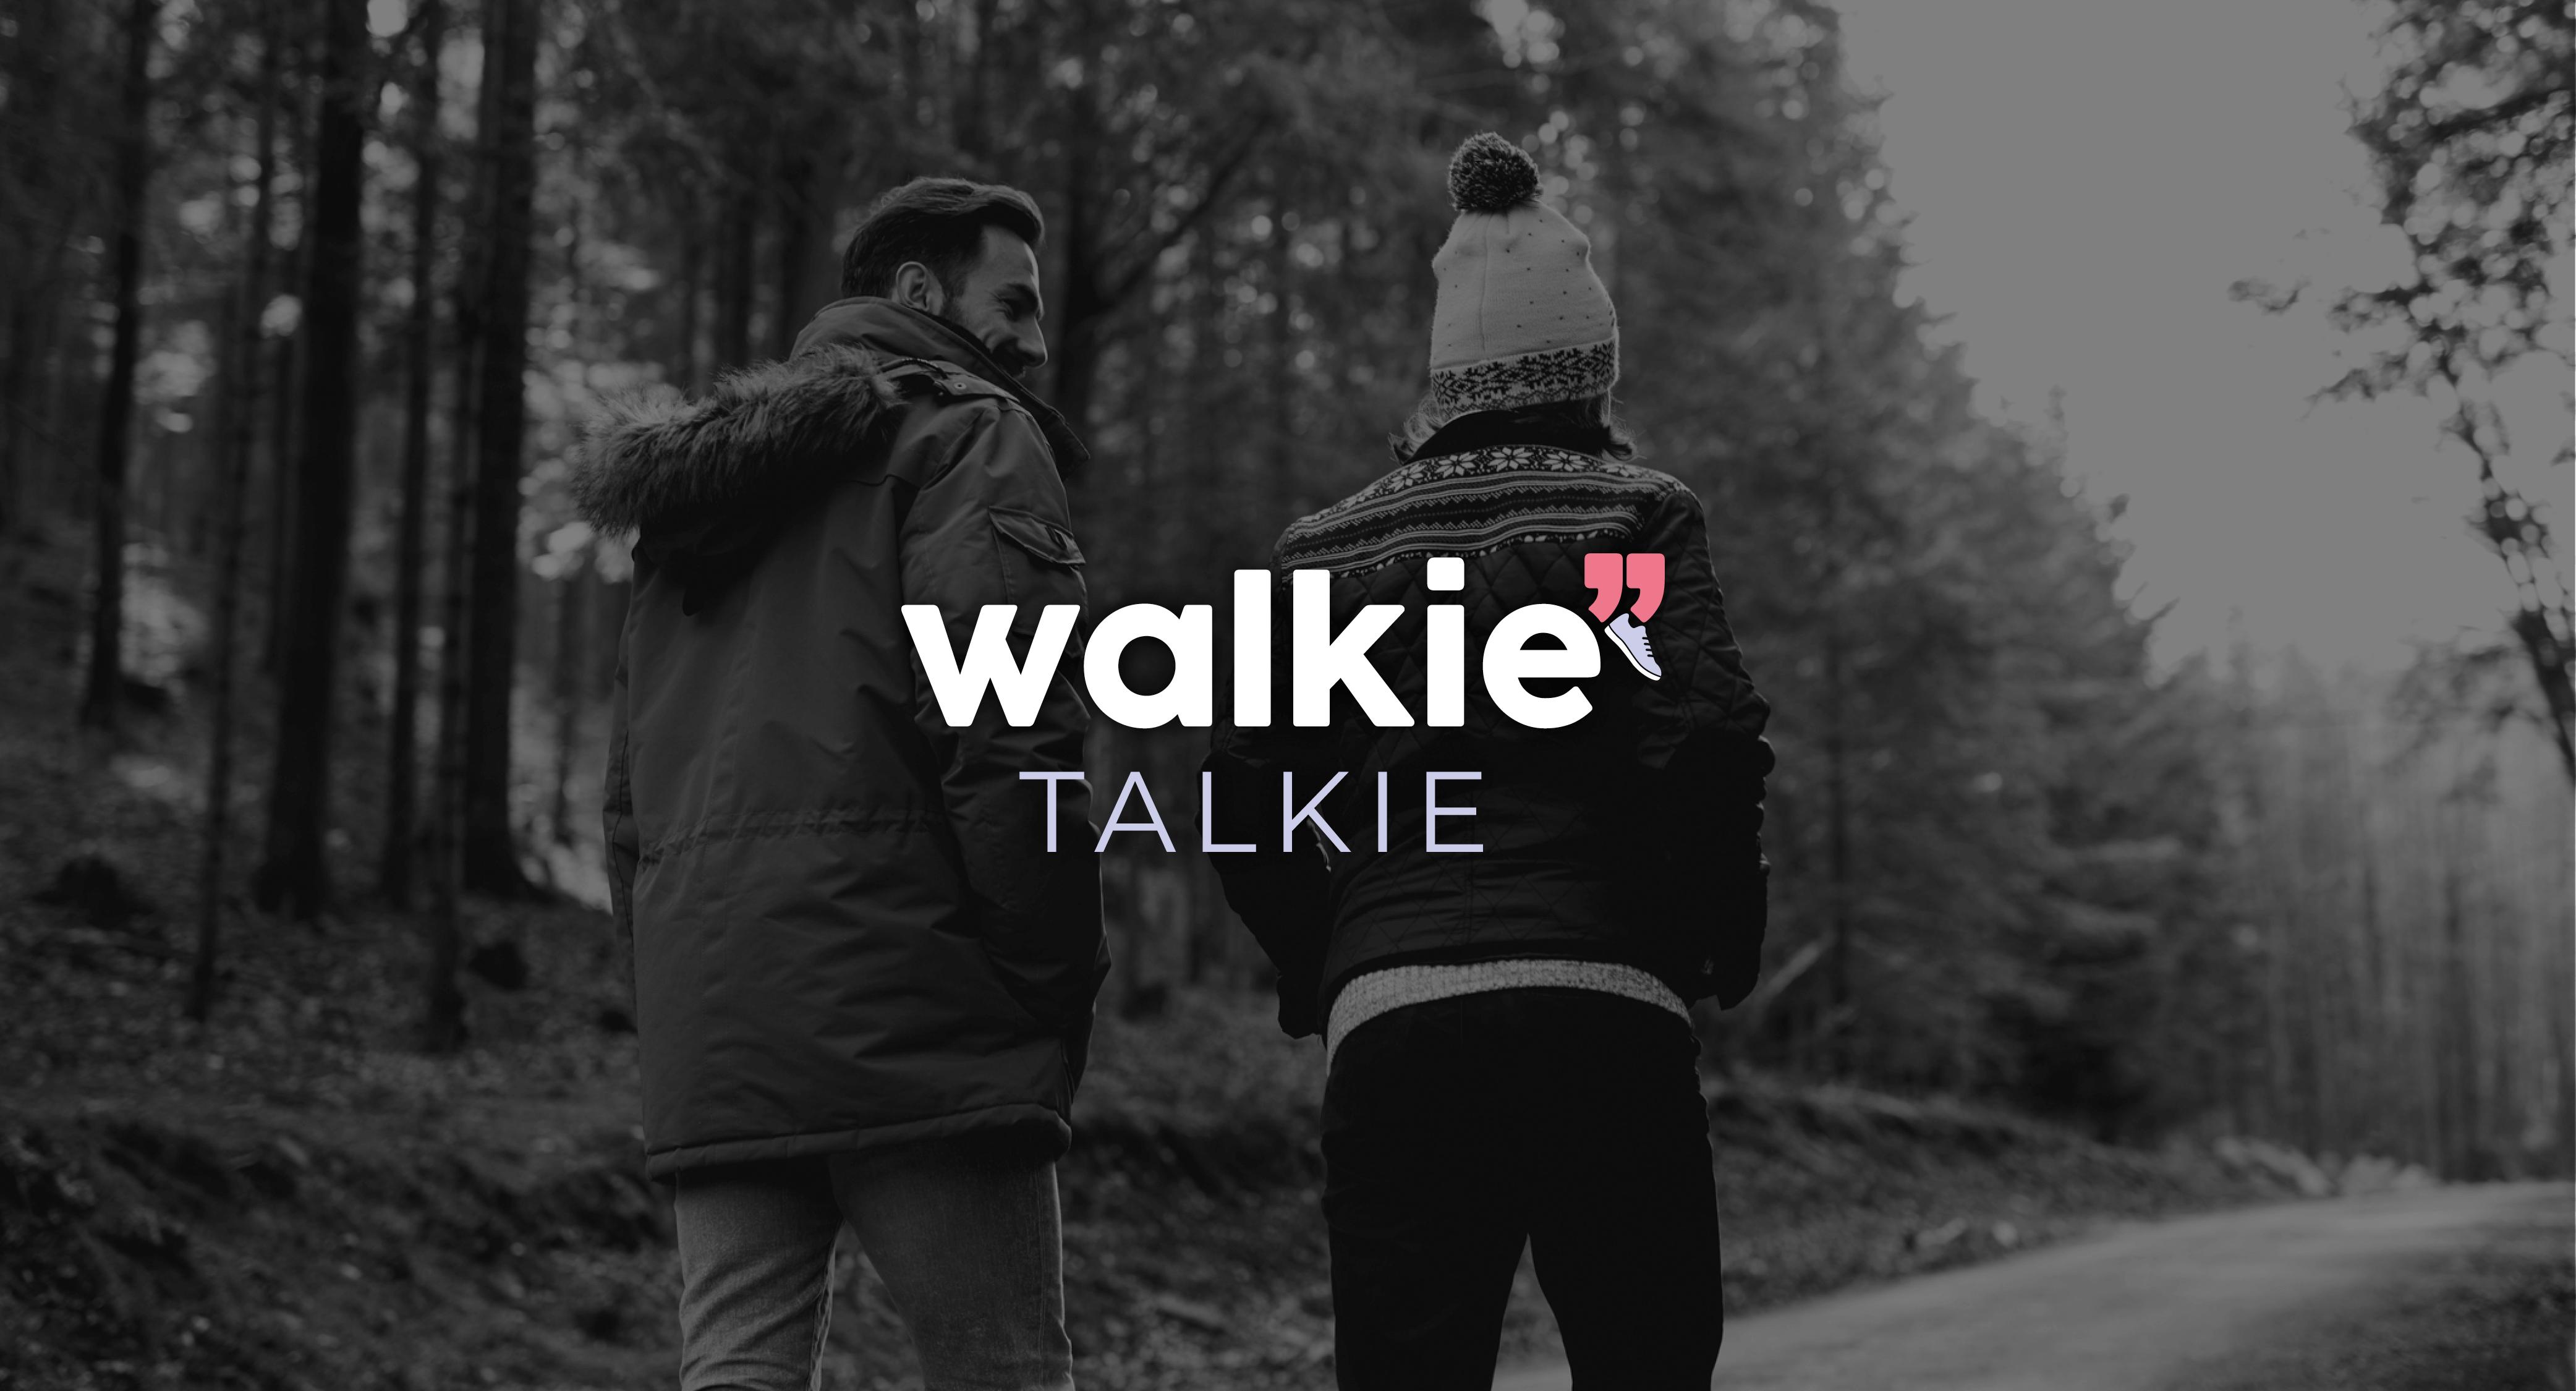 Walkie Talkie Graphic